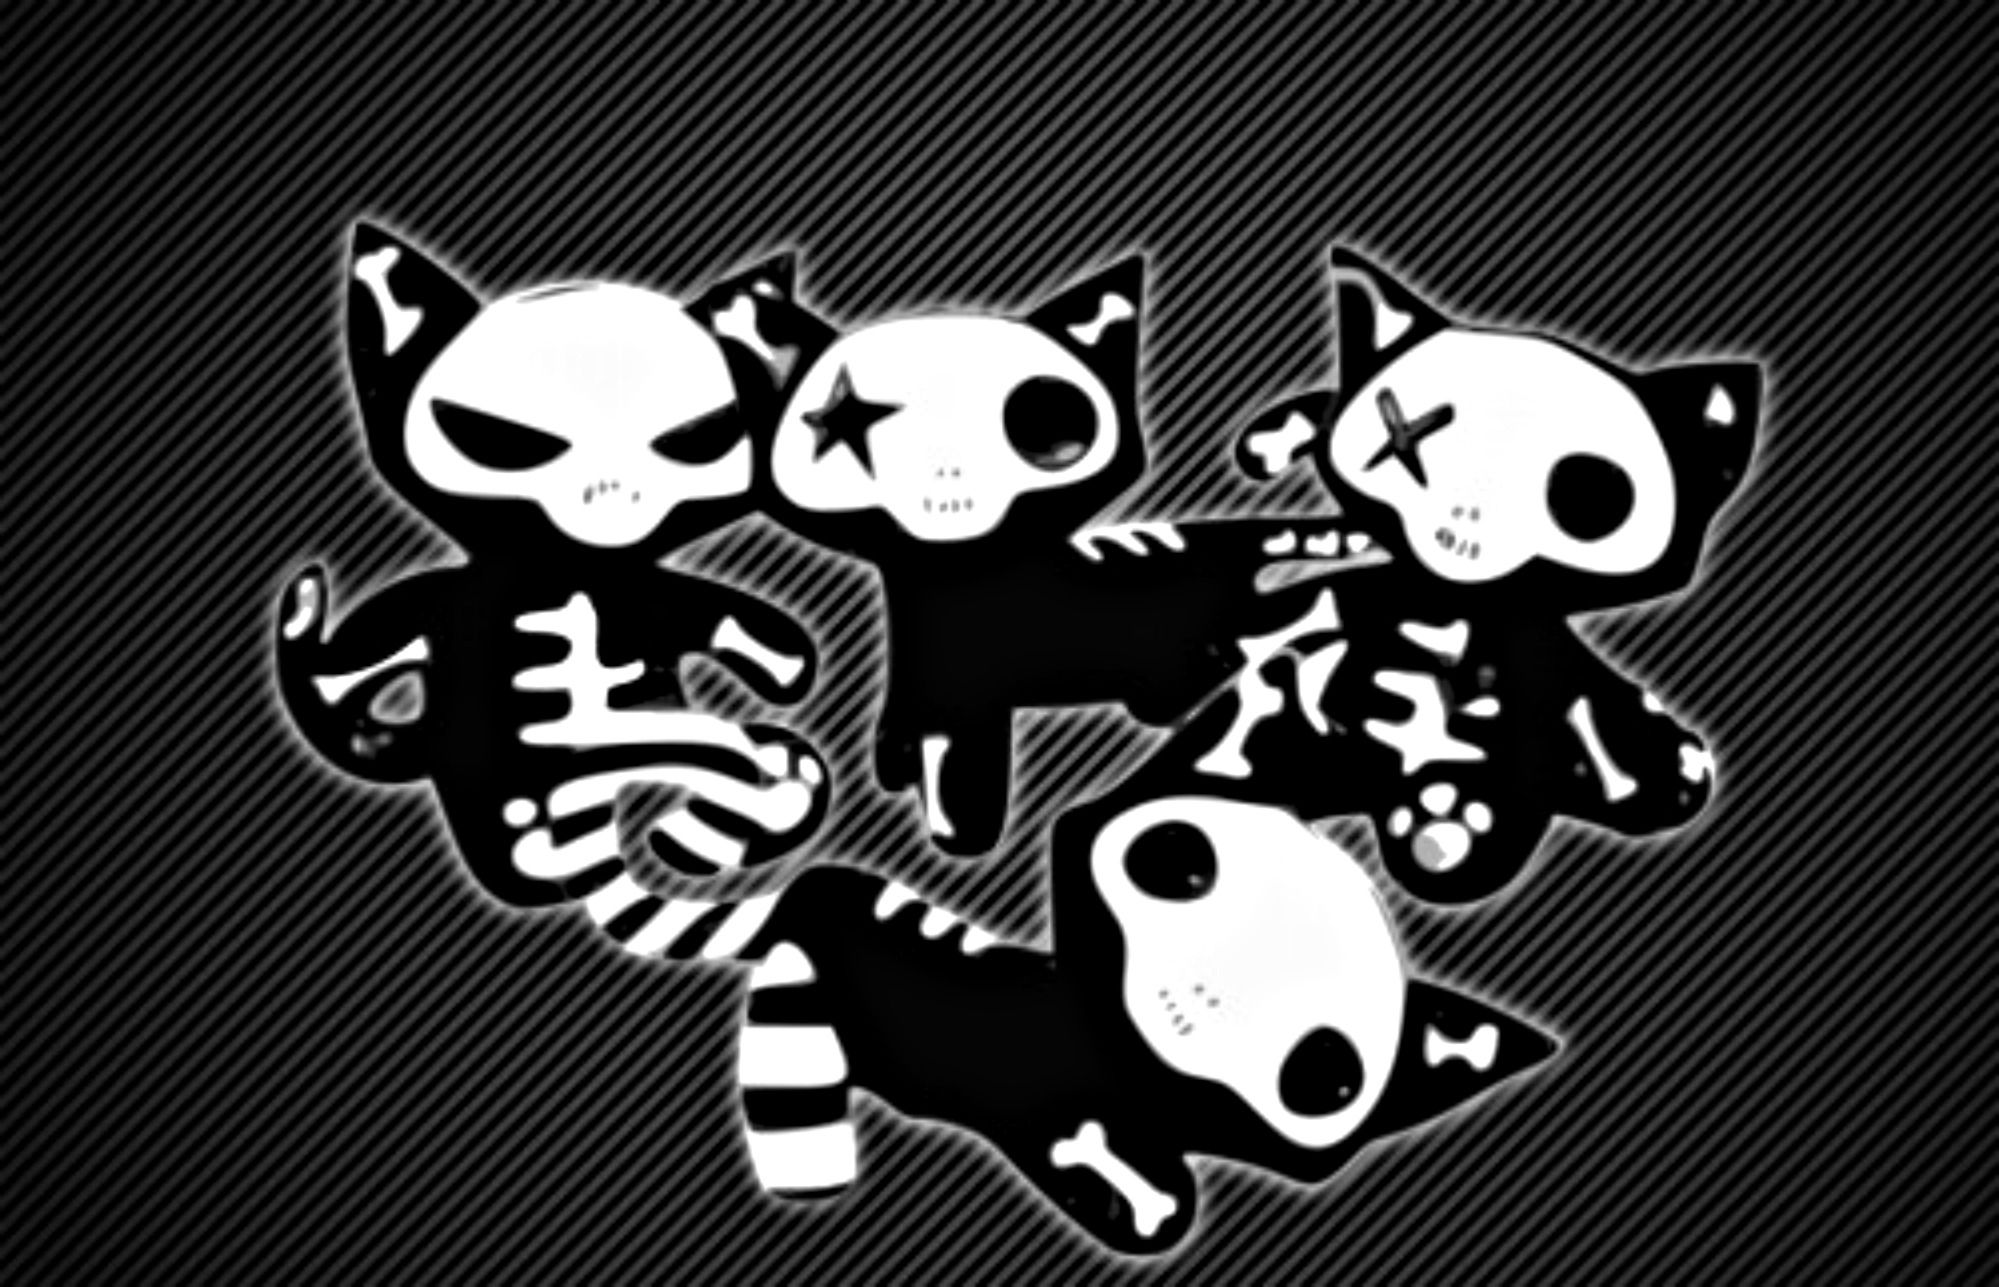 Cute Skull Wallpapers - Wallpaper Cave